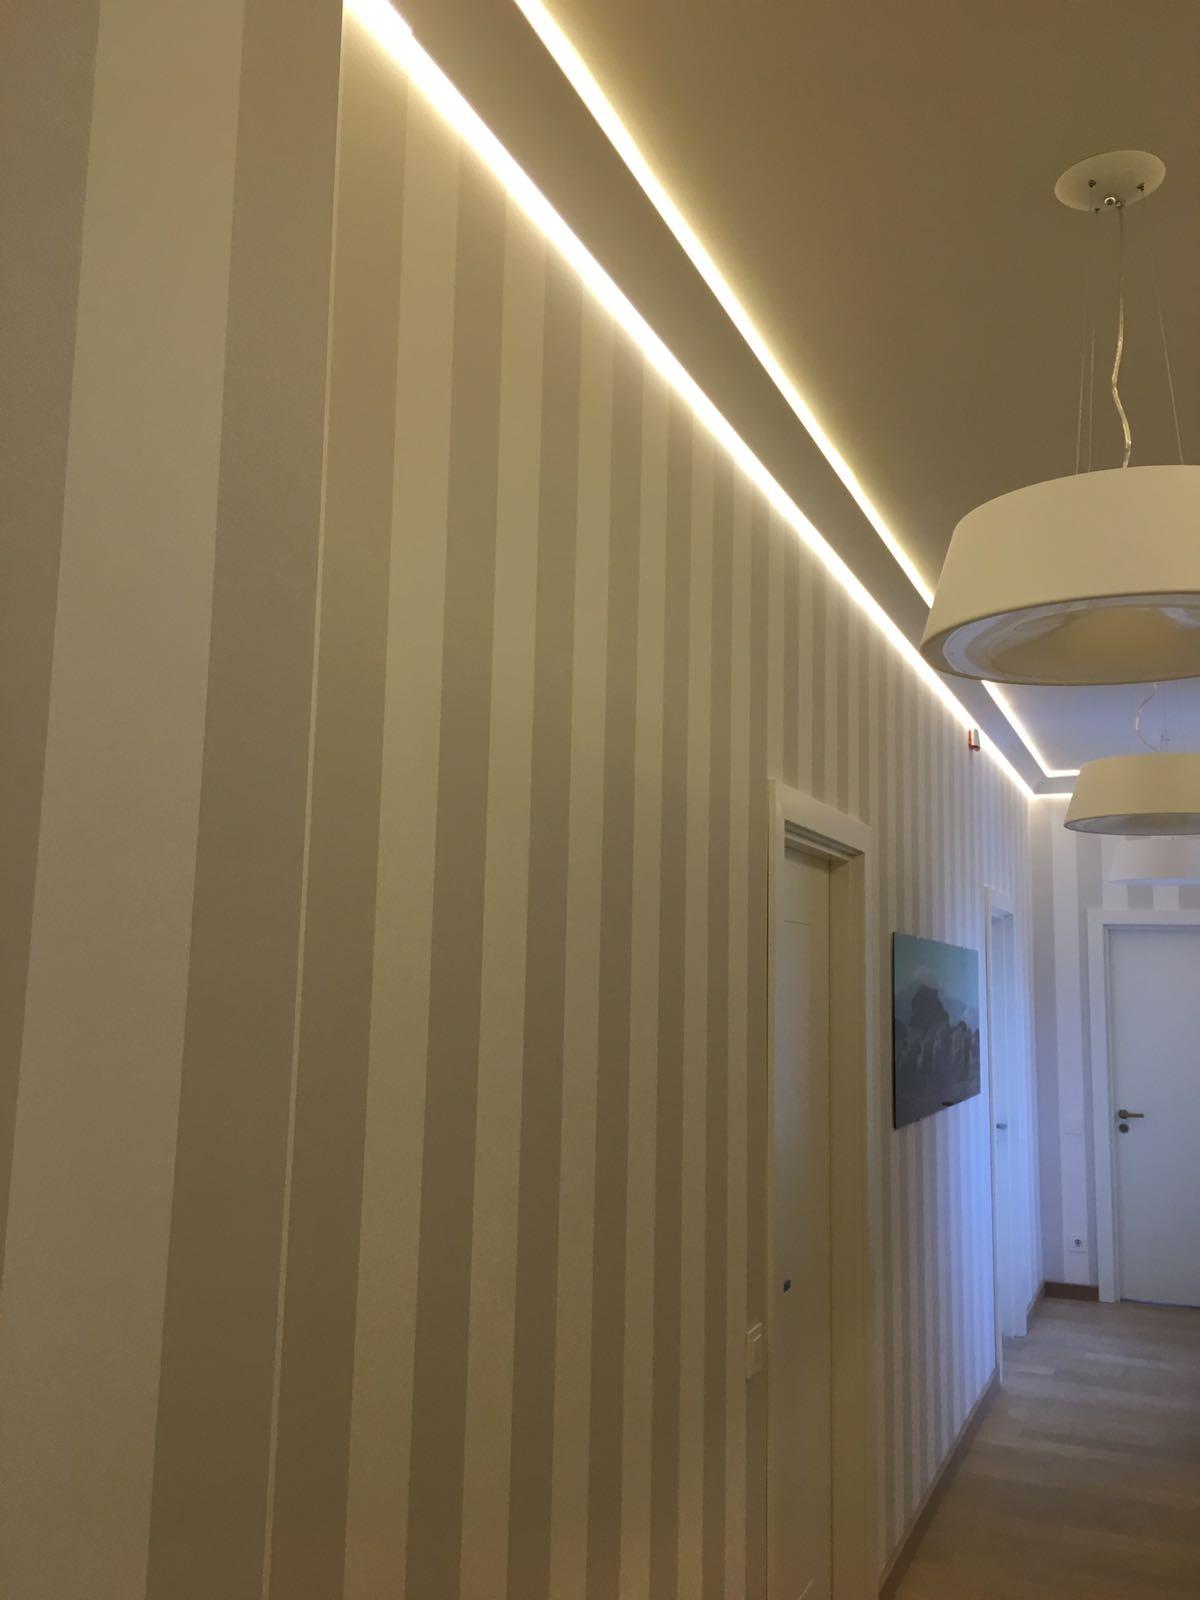 indirect lighting ceiling. home / indirect lighting ceiling cornice kf706